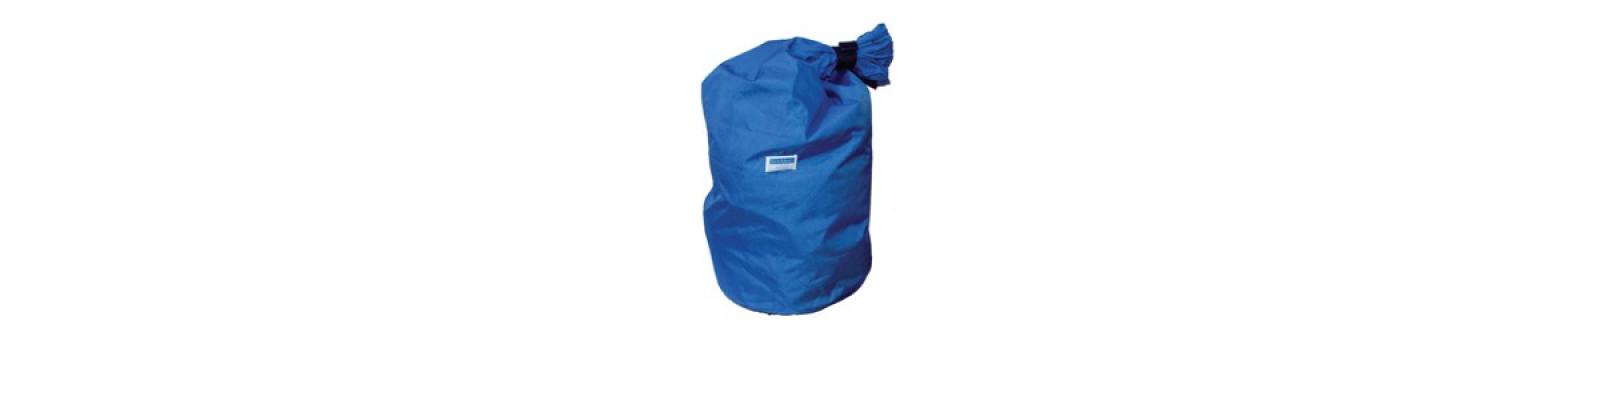 Strongman equipment - Sandbags